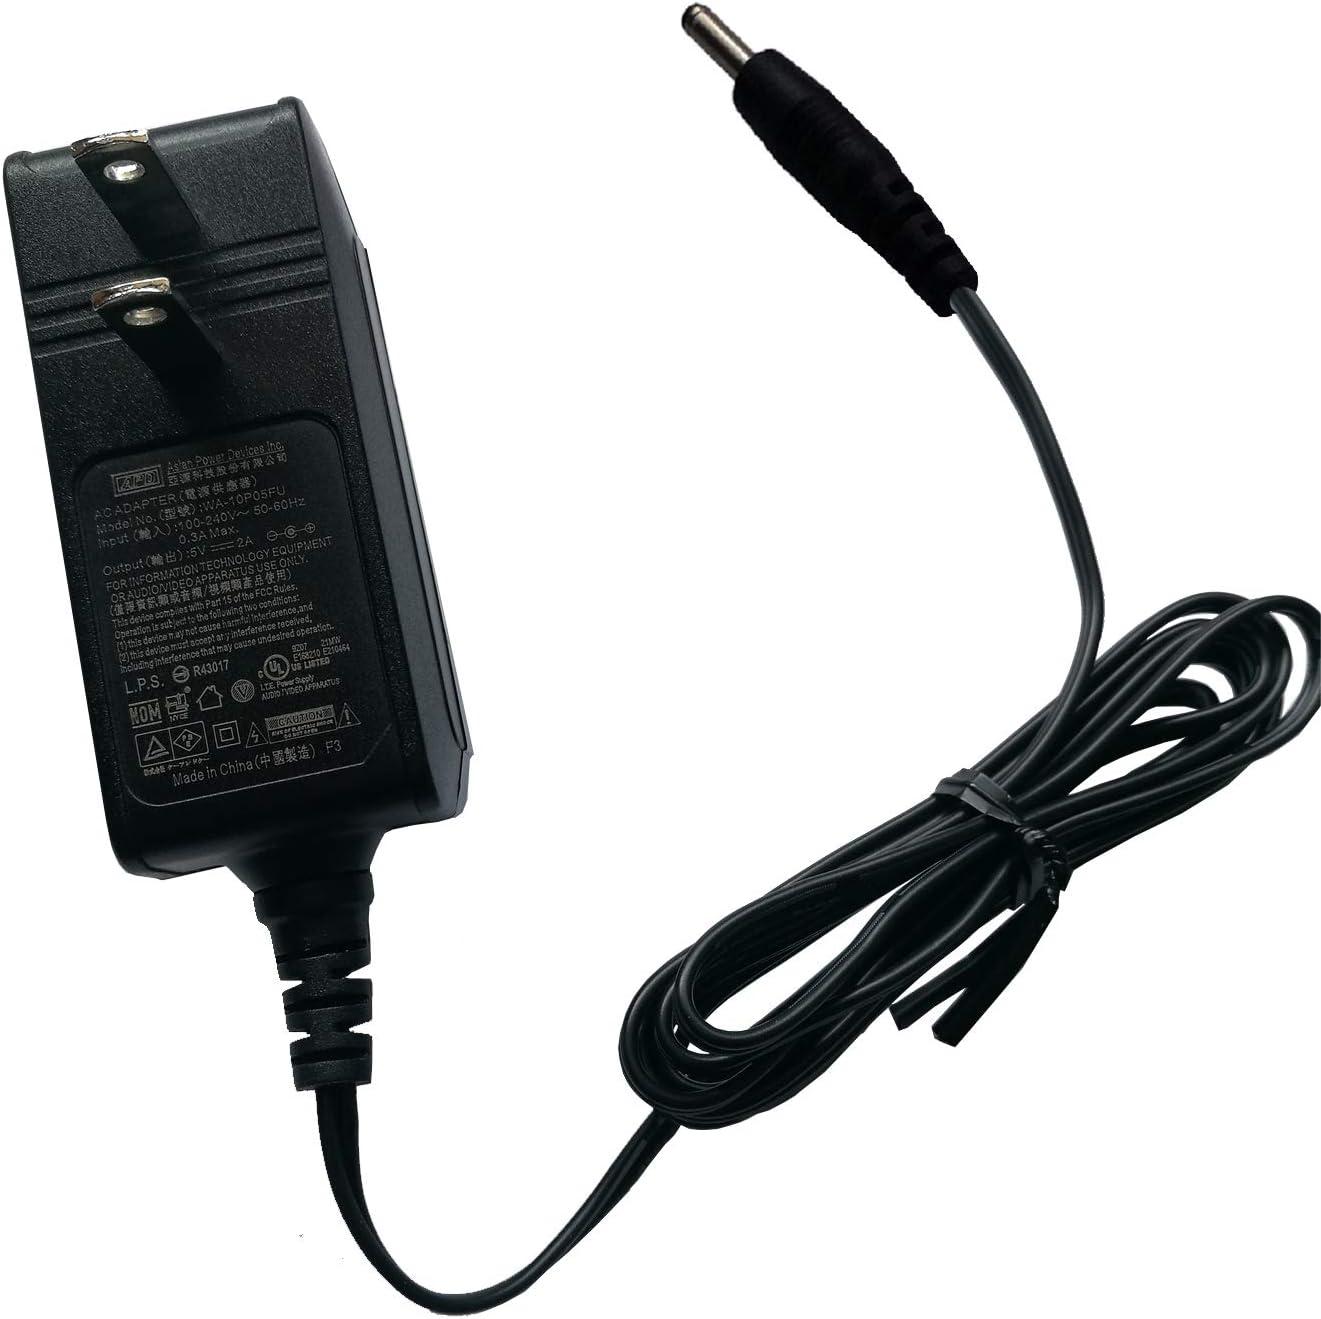 Power Supply Class II Equipment New PS AC Adapter For Csec CS12B050200FUF I.T.E